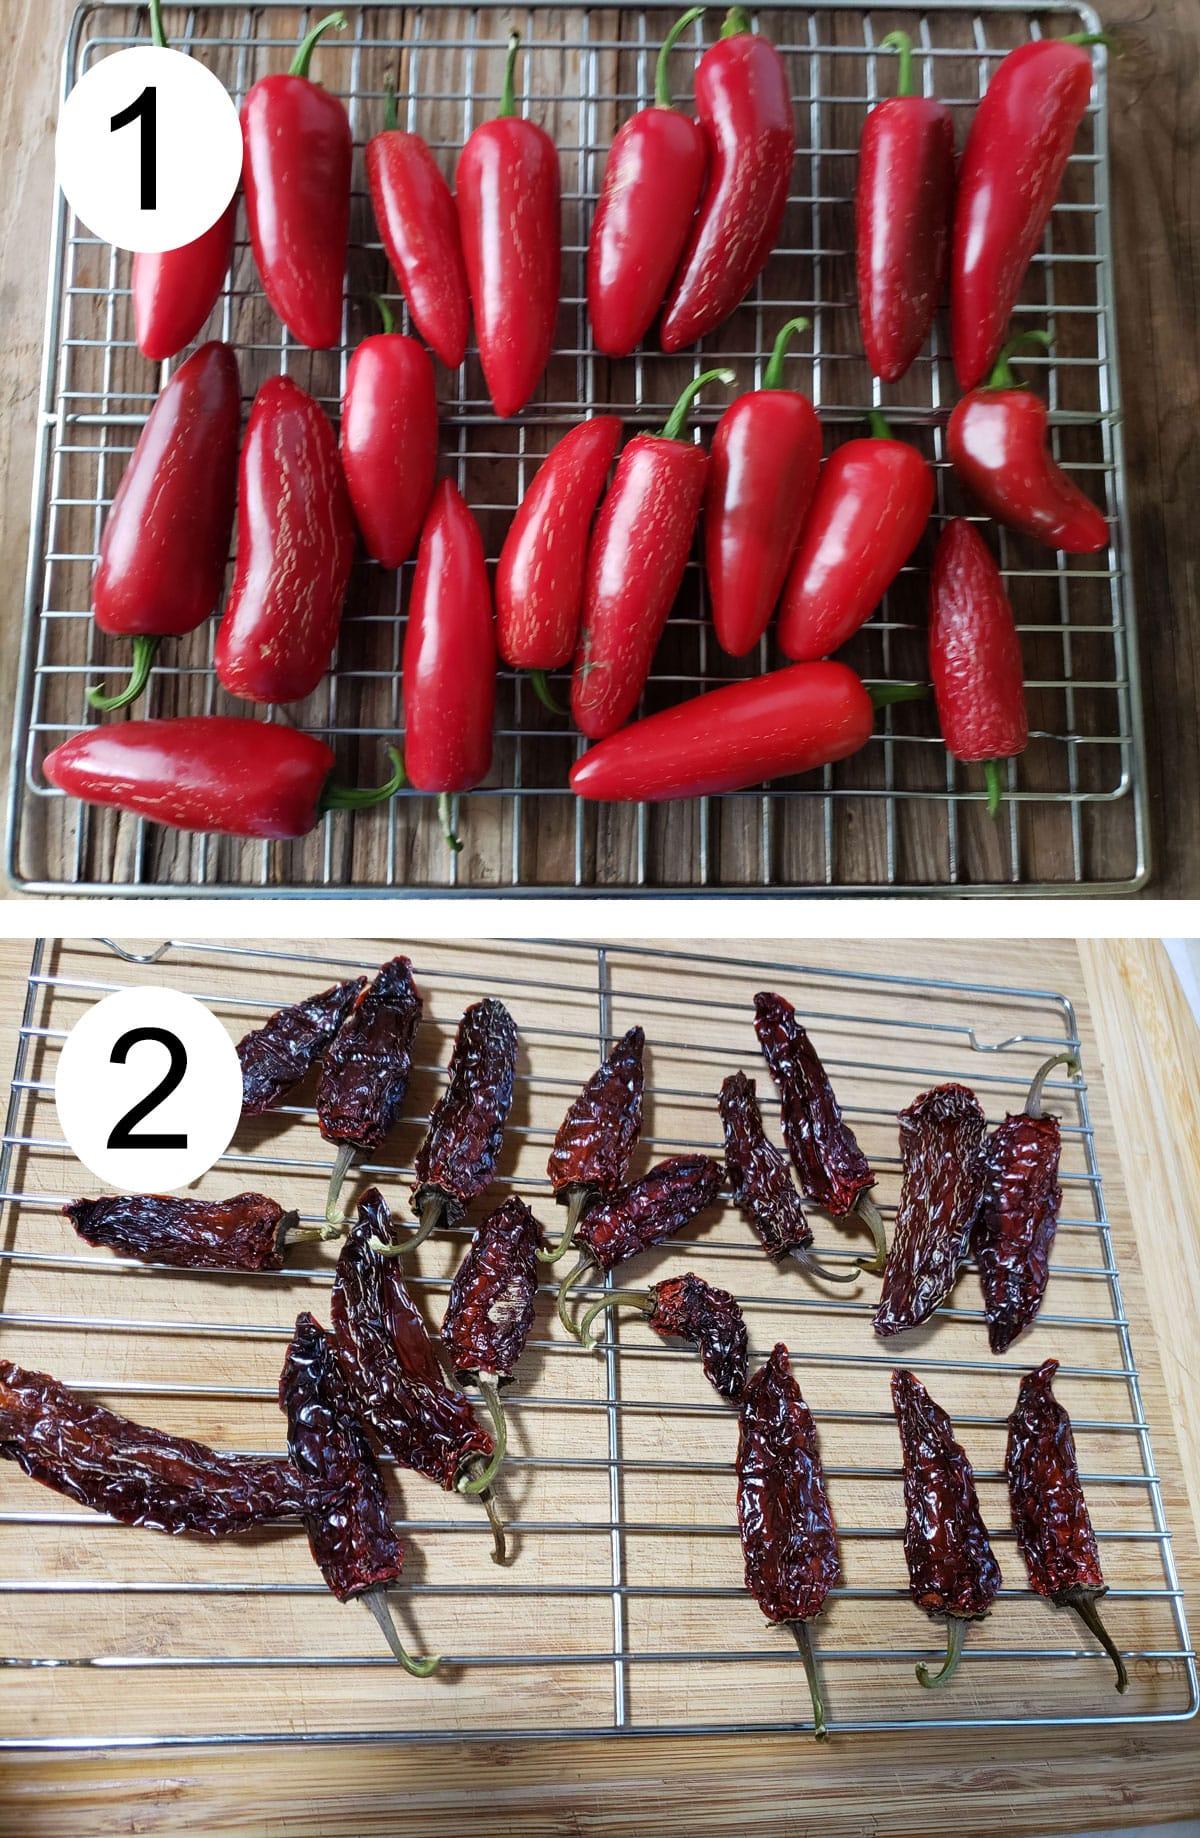 Fresh jalapenos on racks. Dried chipotles on rack